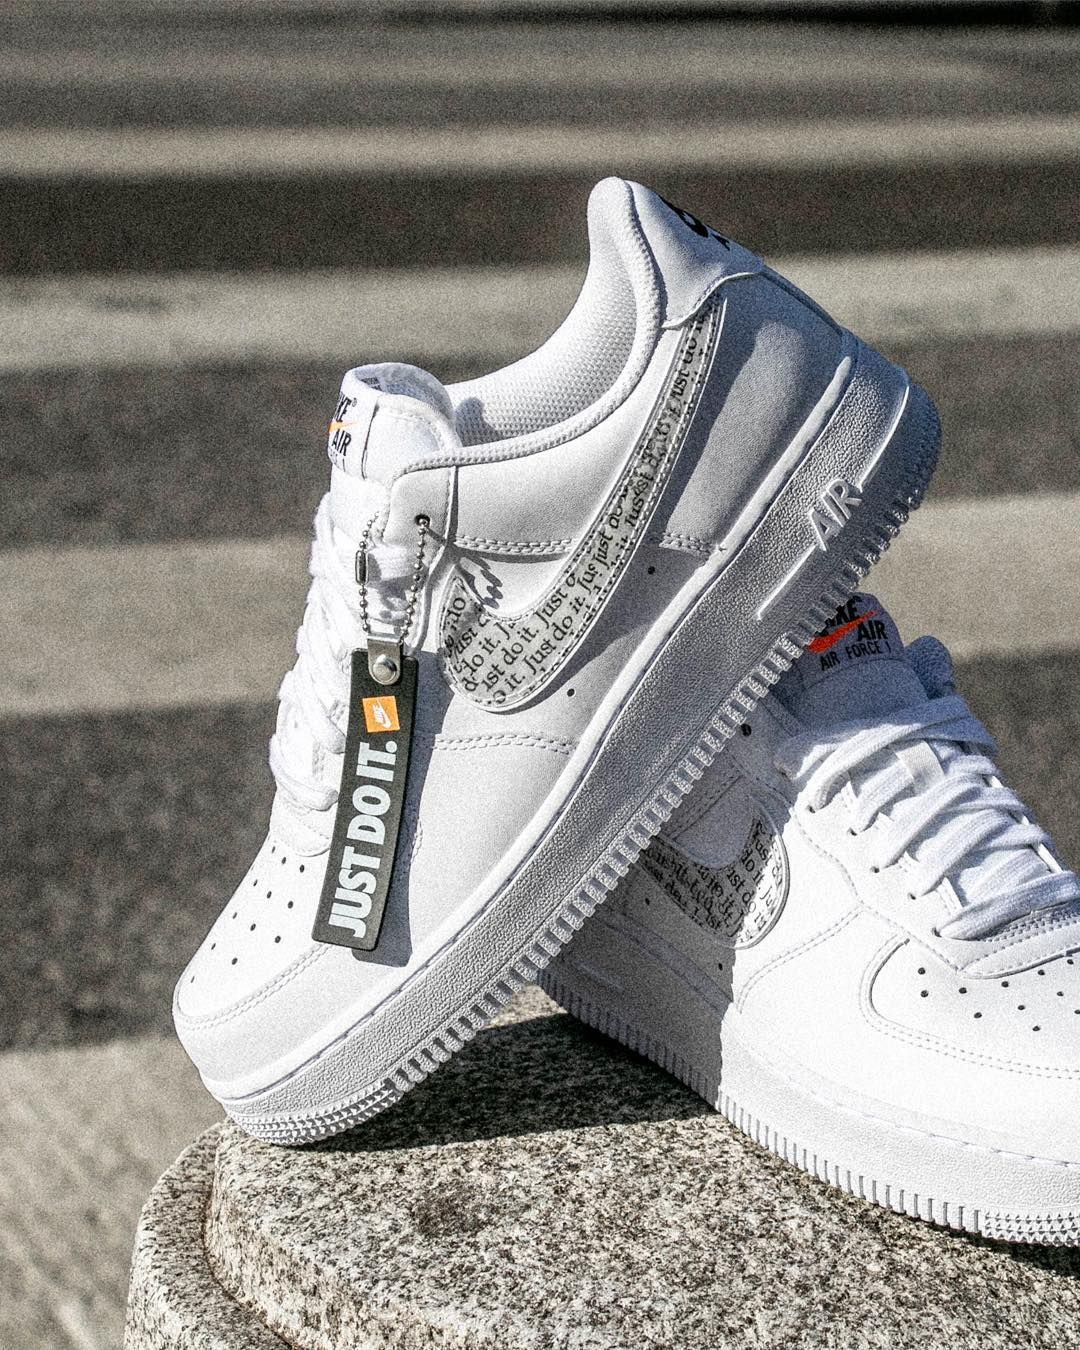 Nike Air Force 1 Just Do It  7116a3e3e